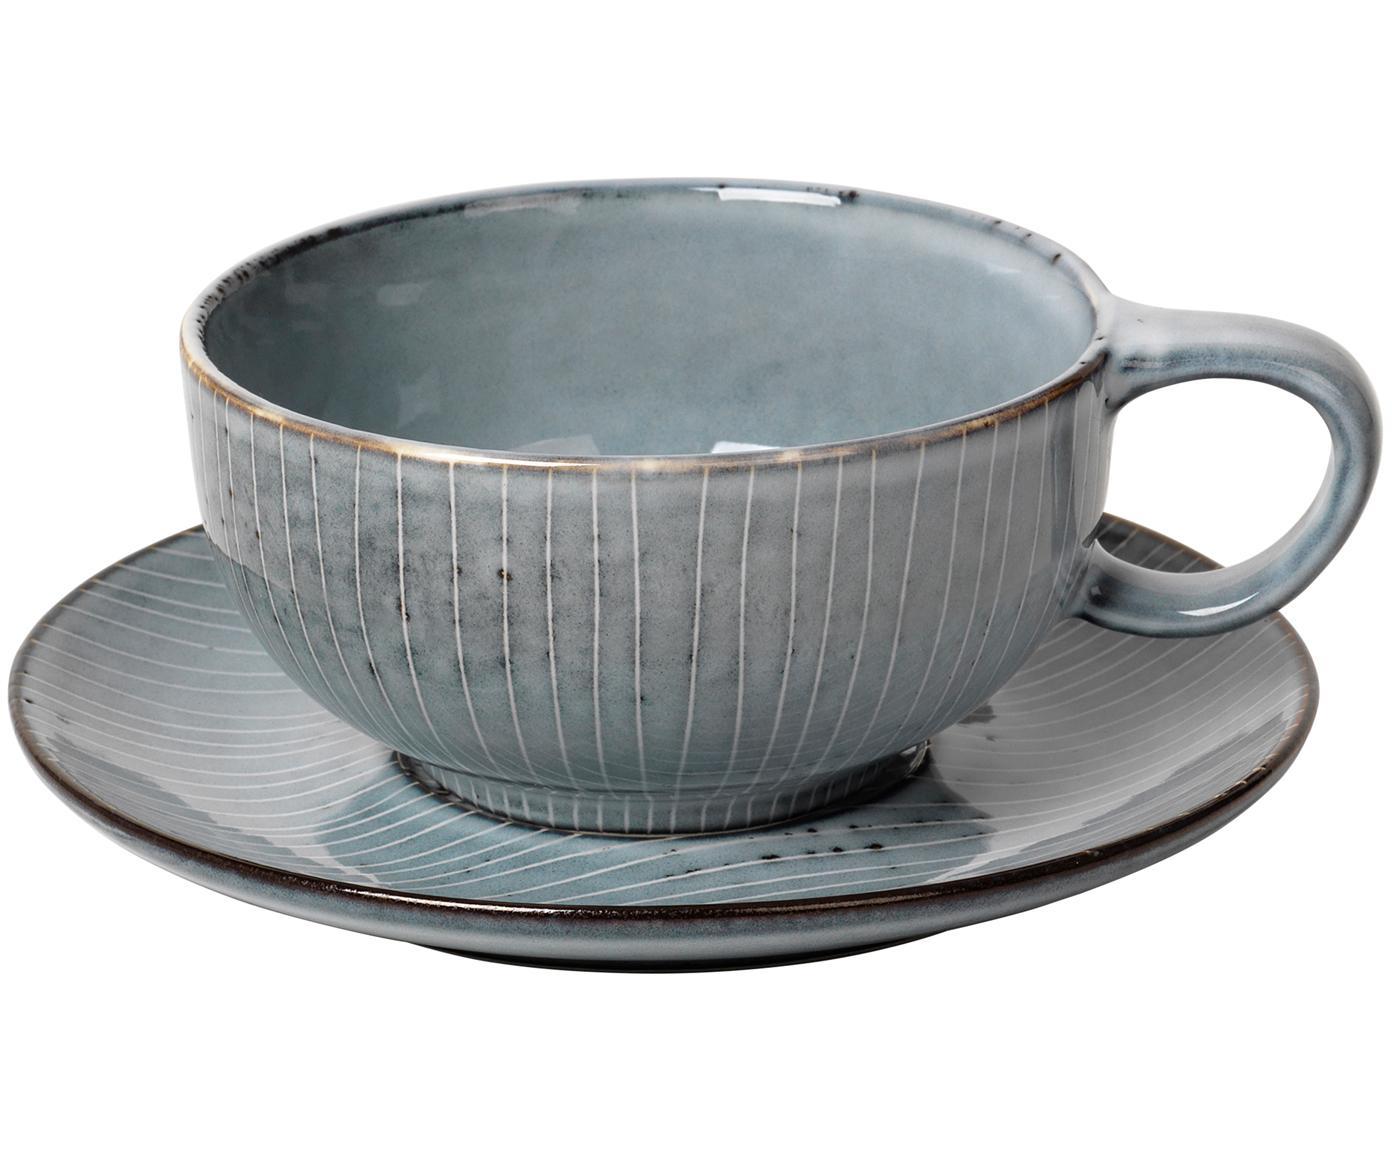 Tazza fatta a mano Nordic Sea, Terracotta, Tonalità grigie e blu, Ø 11 x Alt. 5 cm